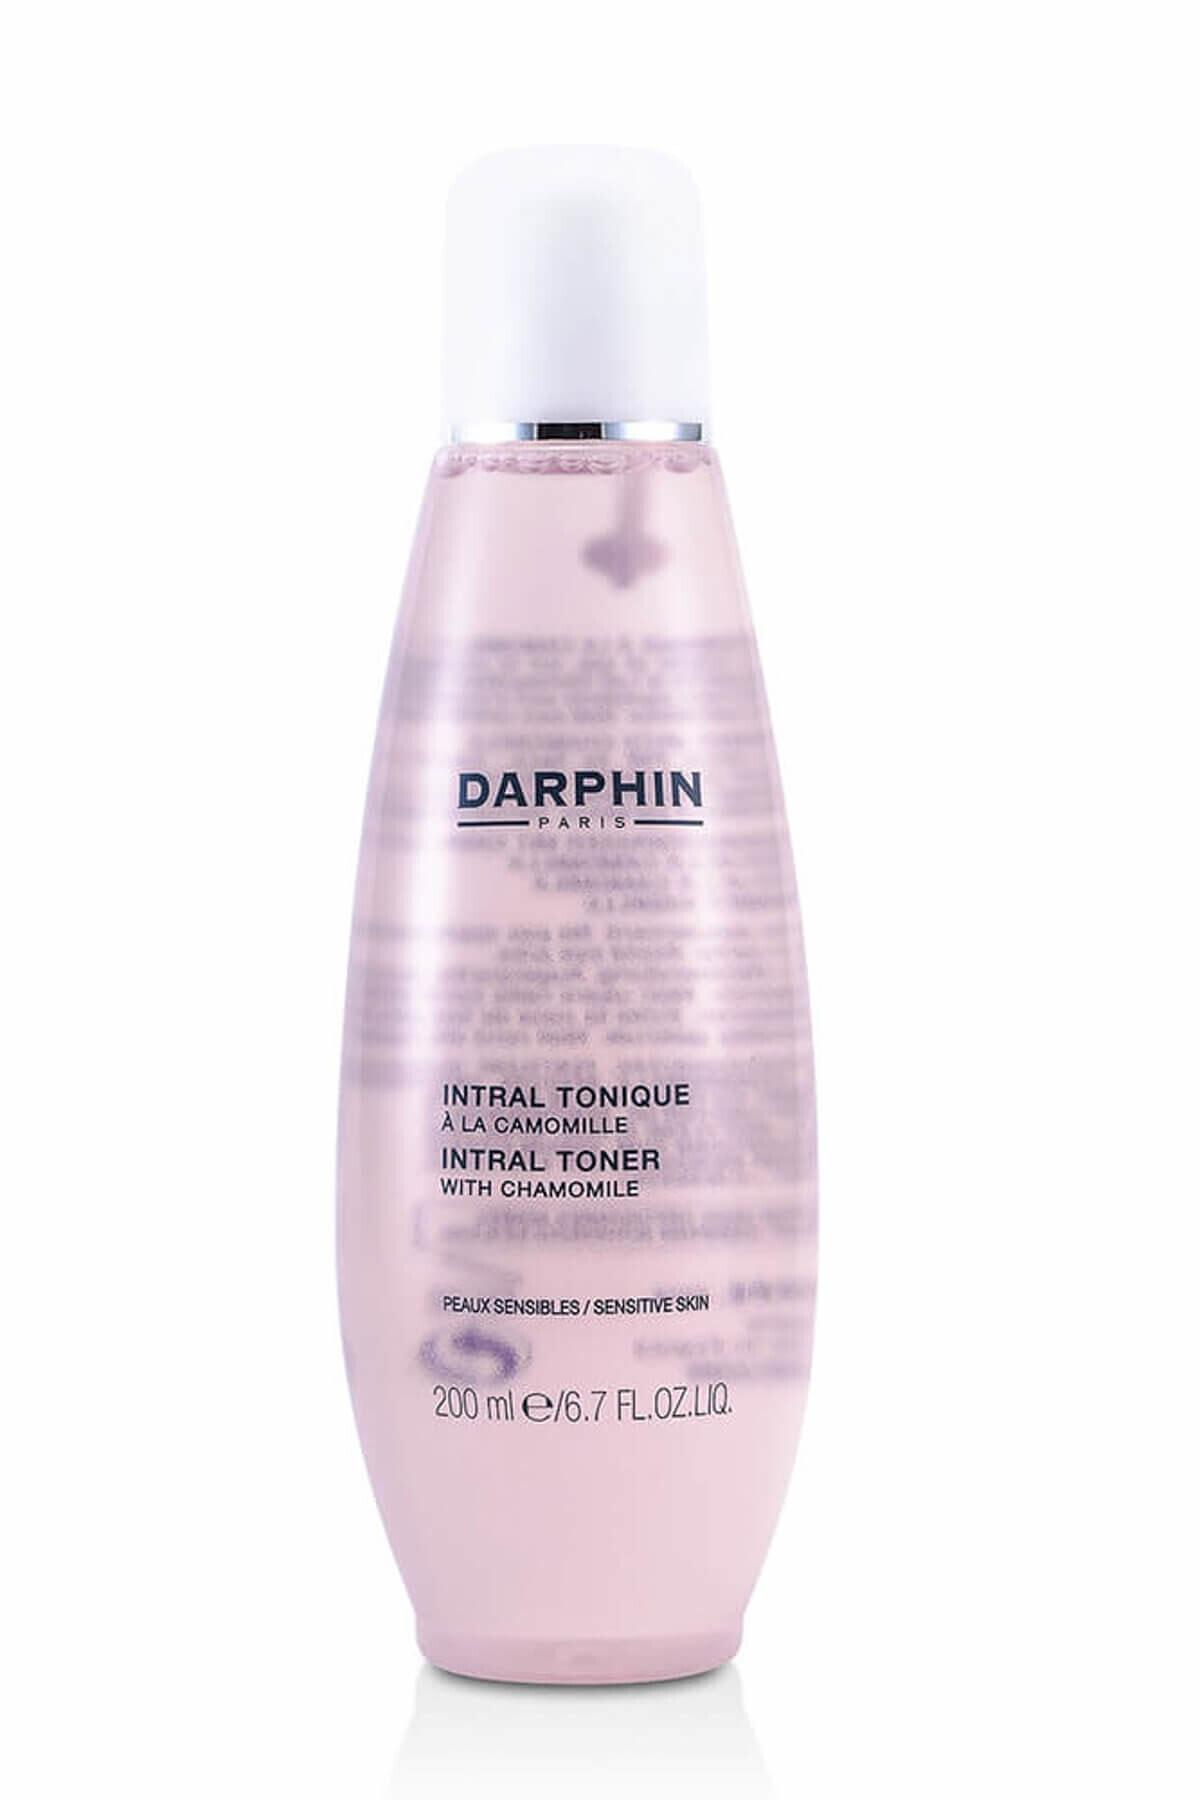 Darphin Intral Toner 200 ml 1